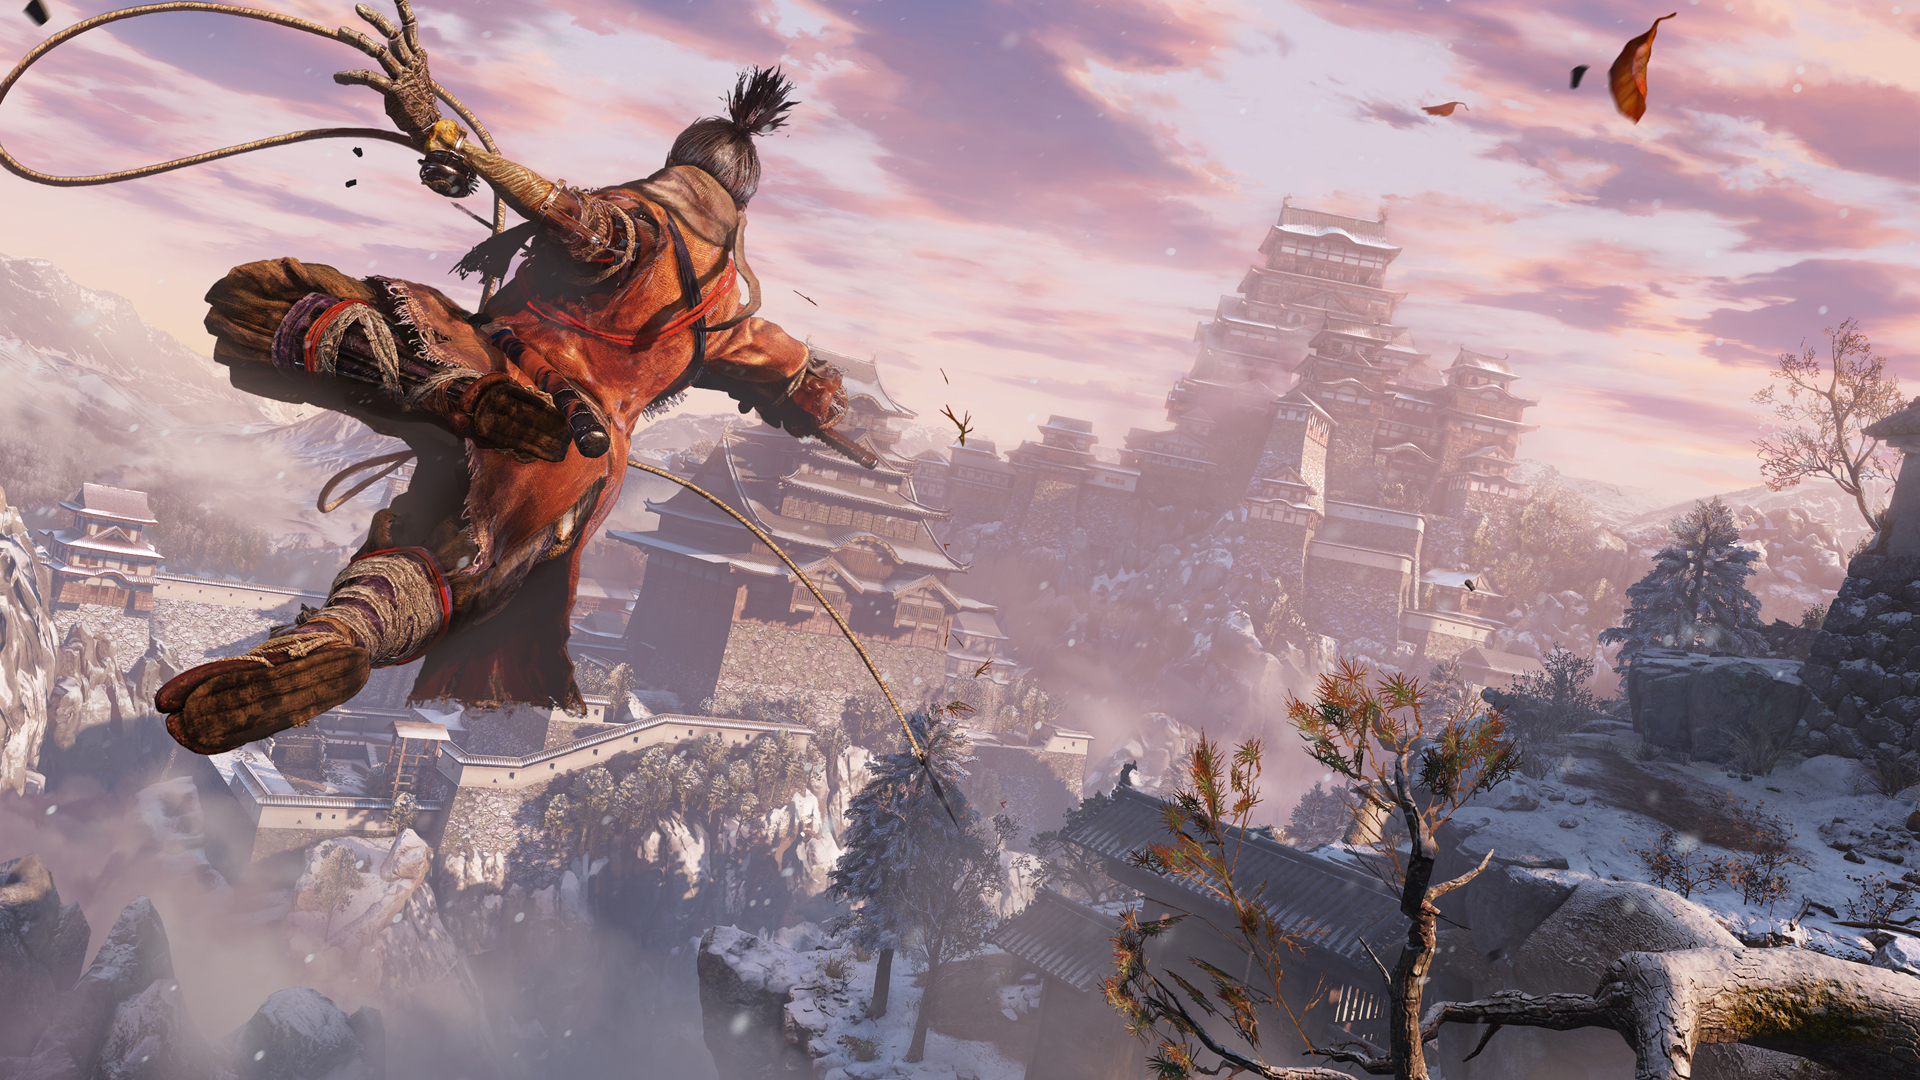 Samurai Souls successor Sekiro: Shadows Die Twice swings onto PC on March 22nd